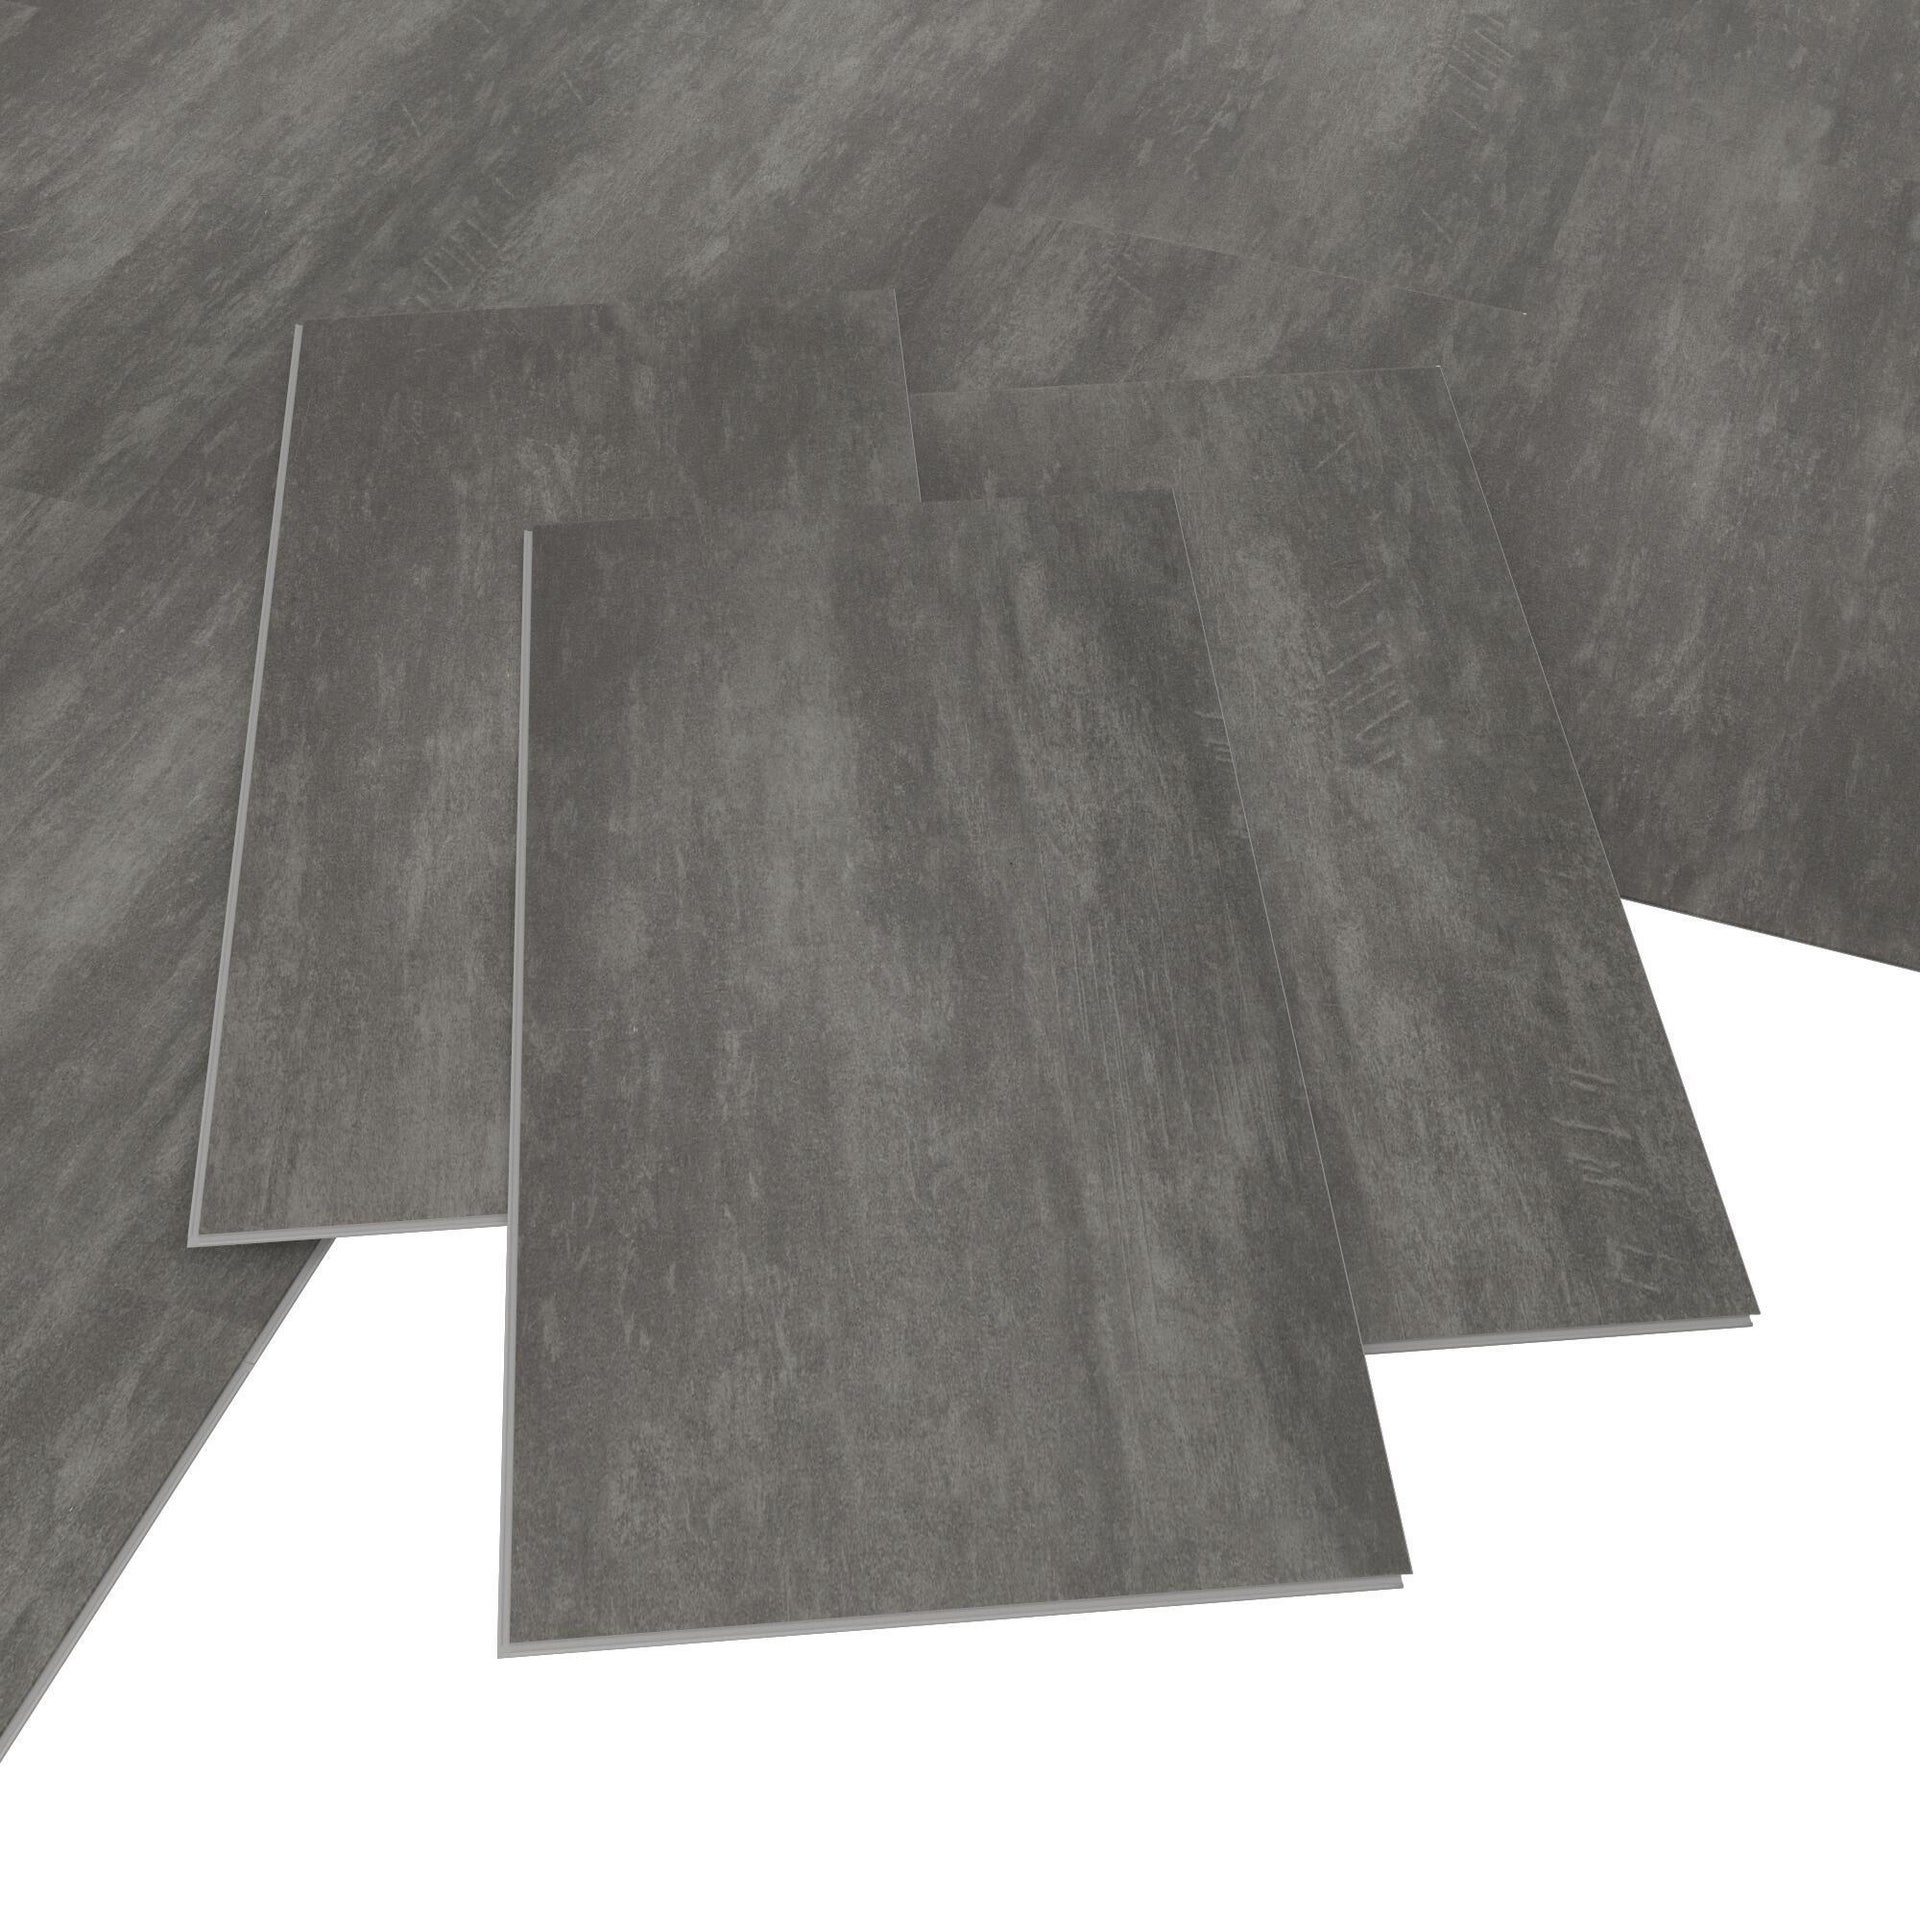 Pavimento PVC incastro Tolu Sp 4 mm grigio / argento - 4